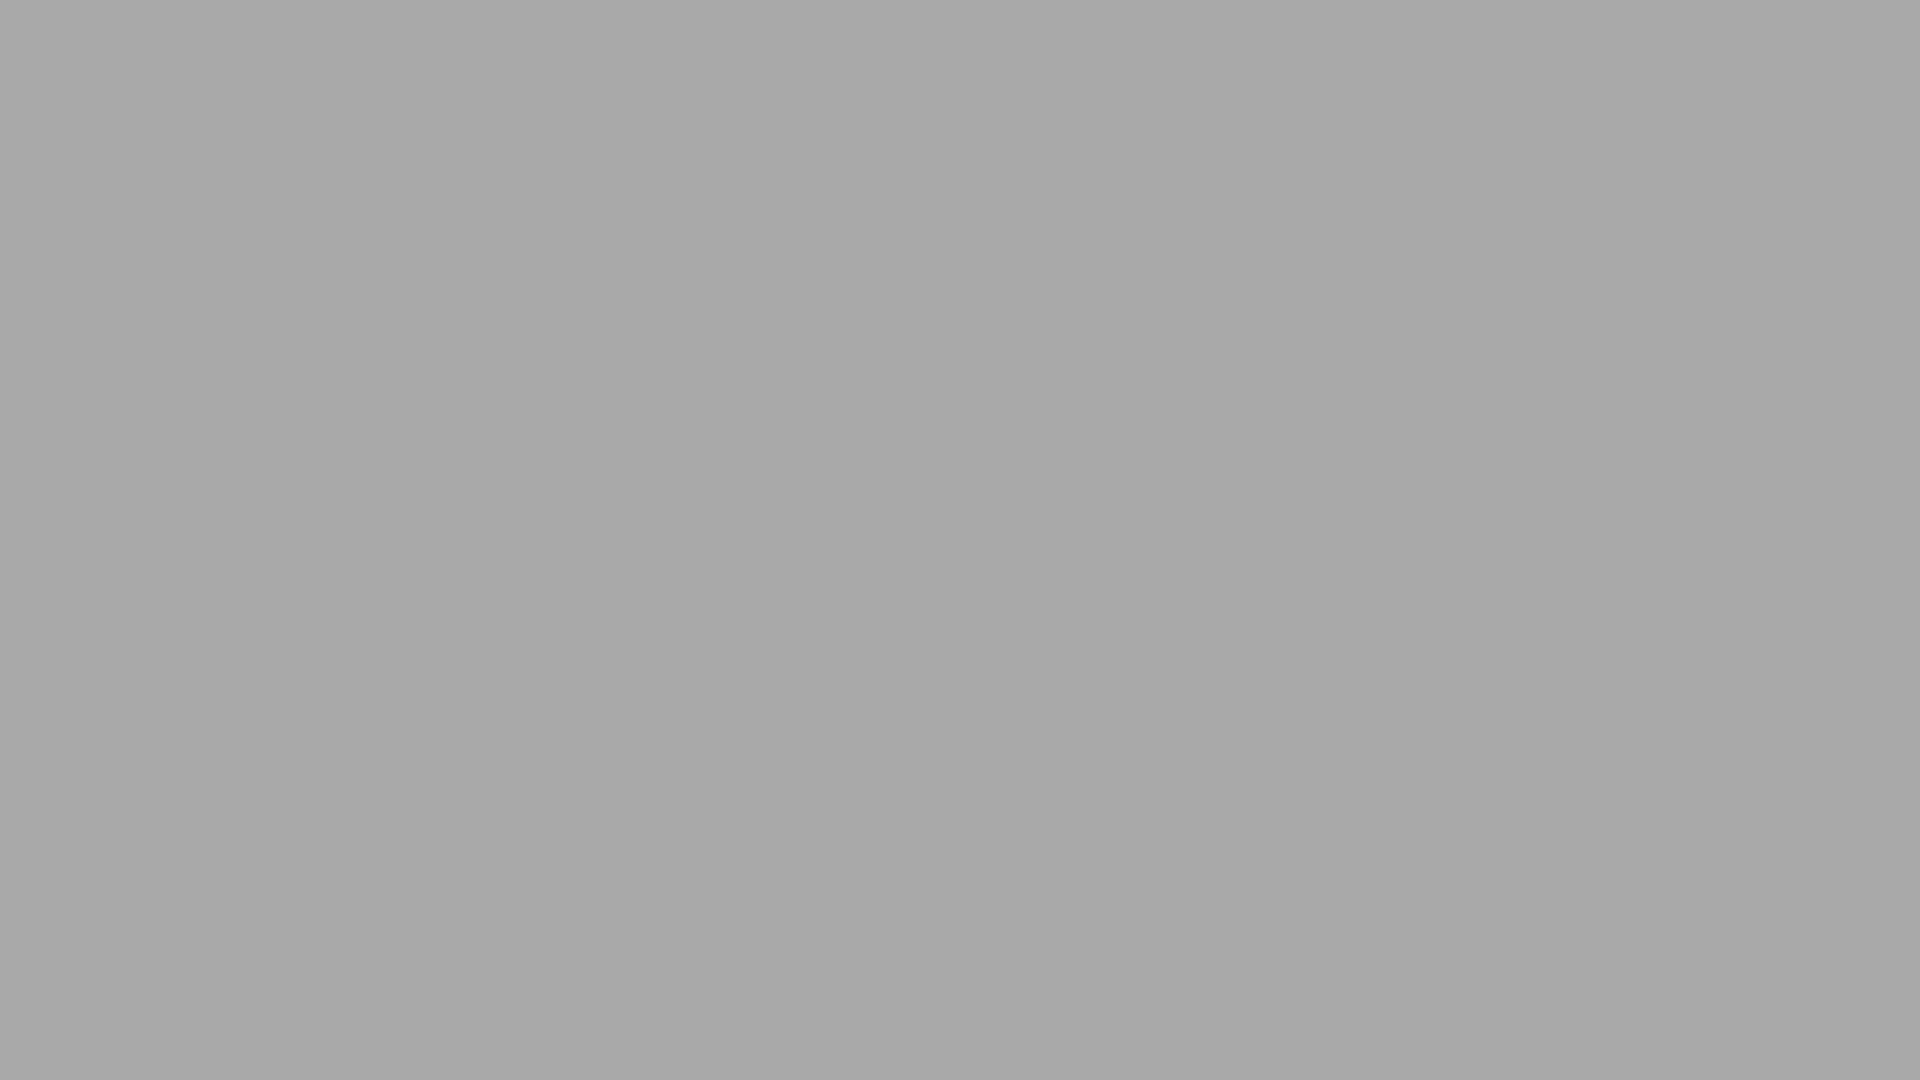 Grey color wallpaper hd wallpapers blog for Cheap plain grey wallpaper